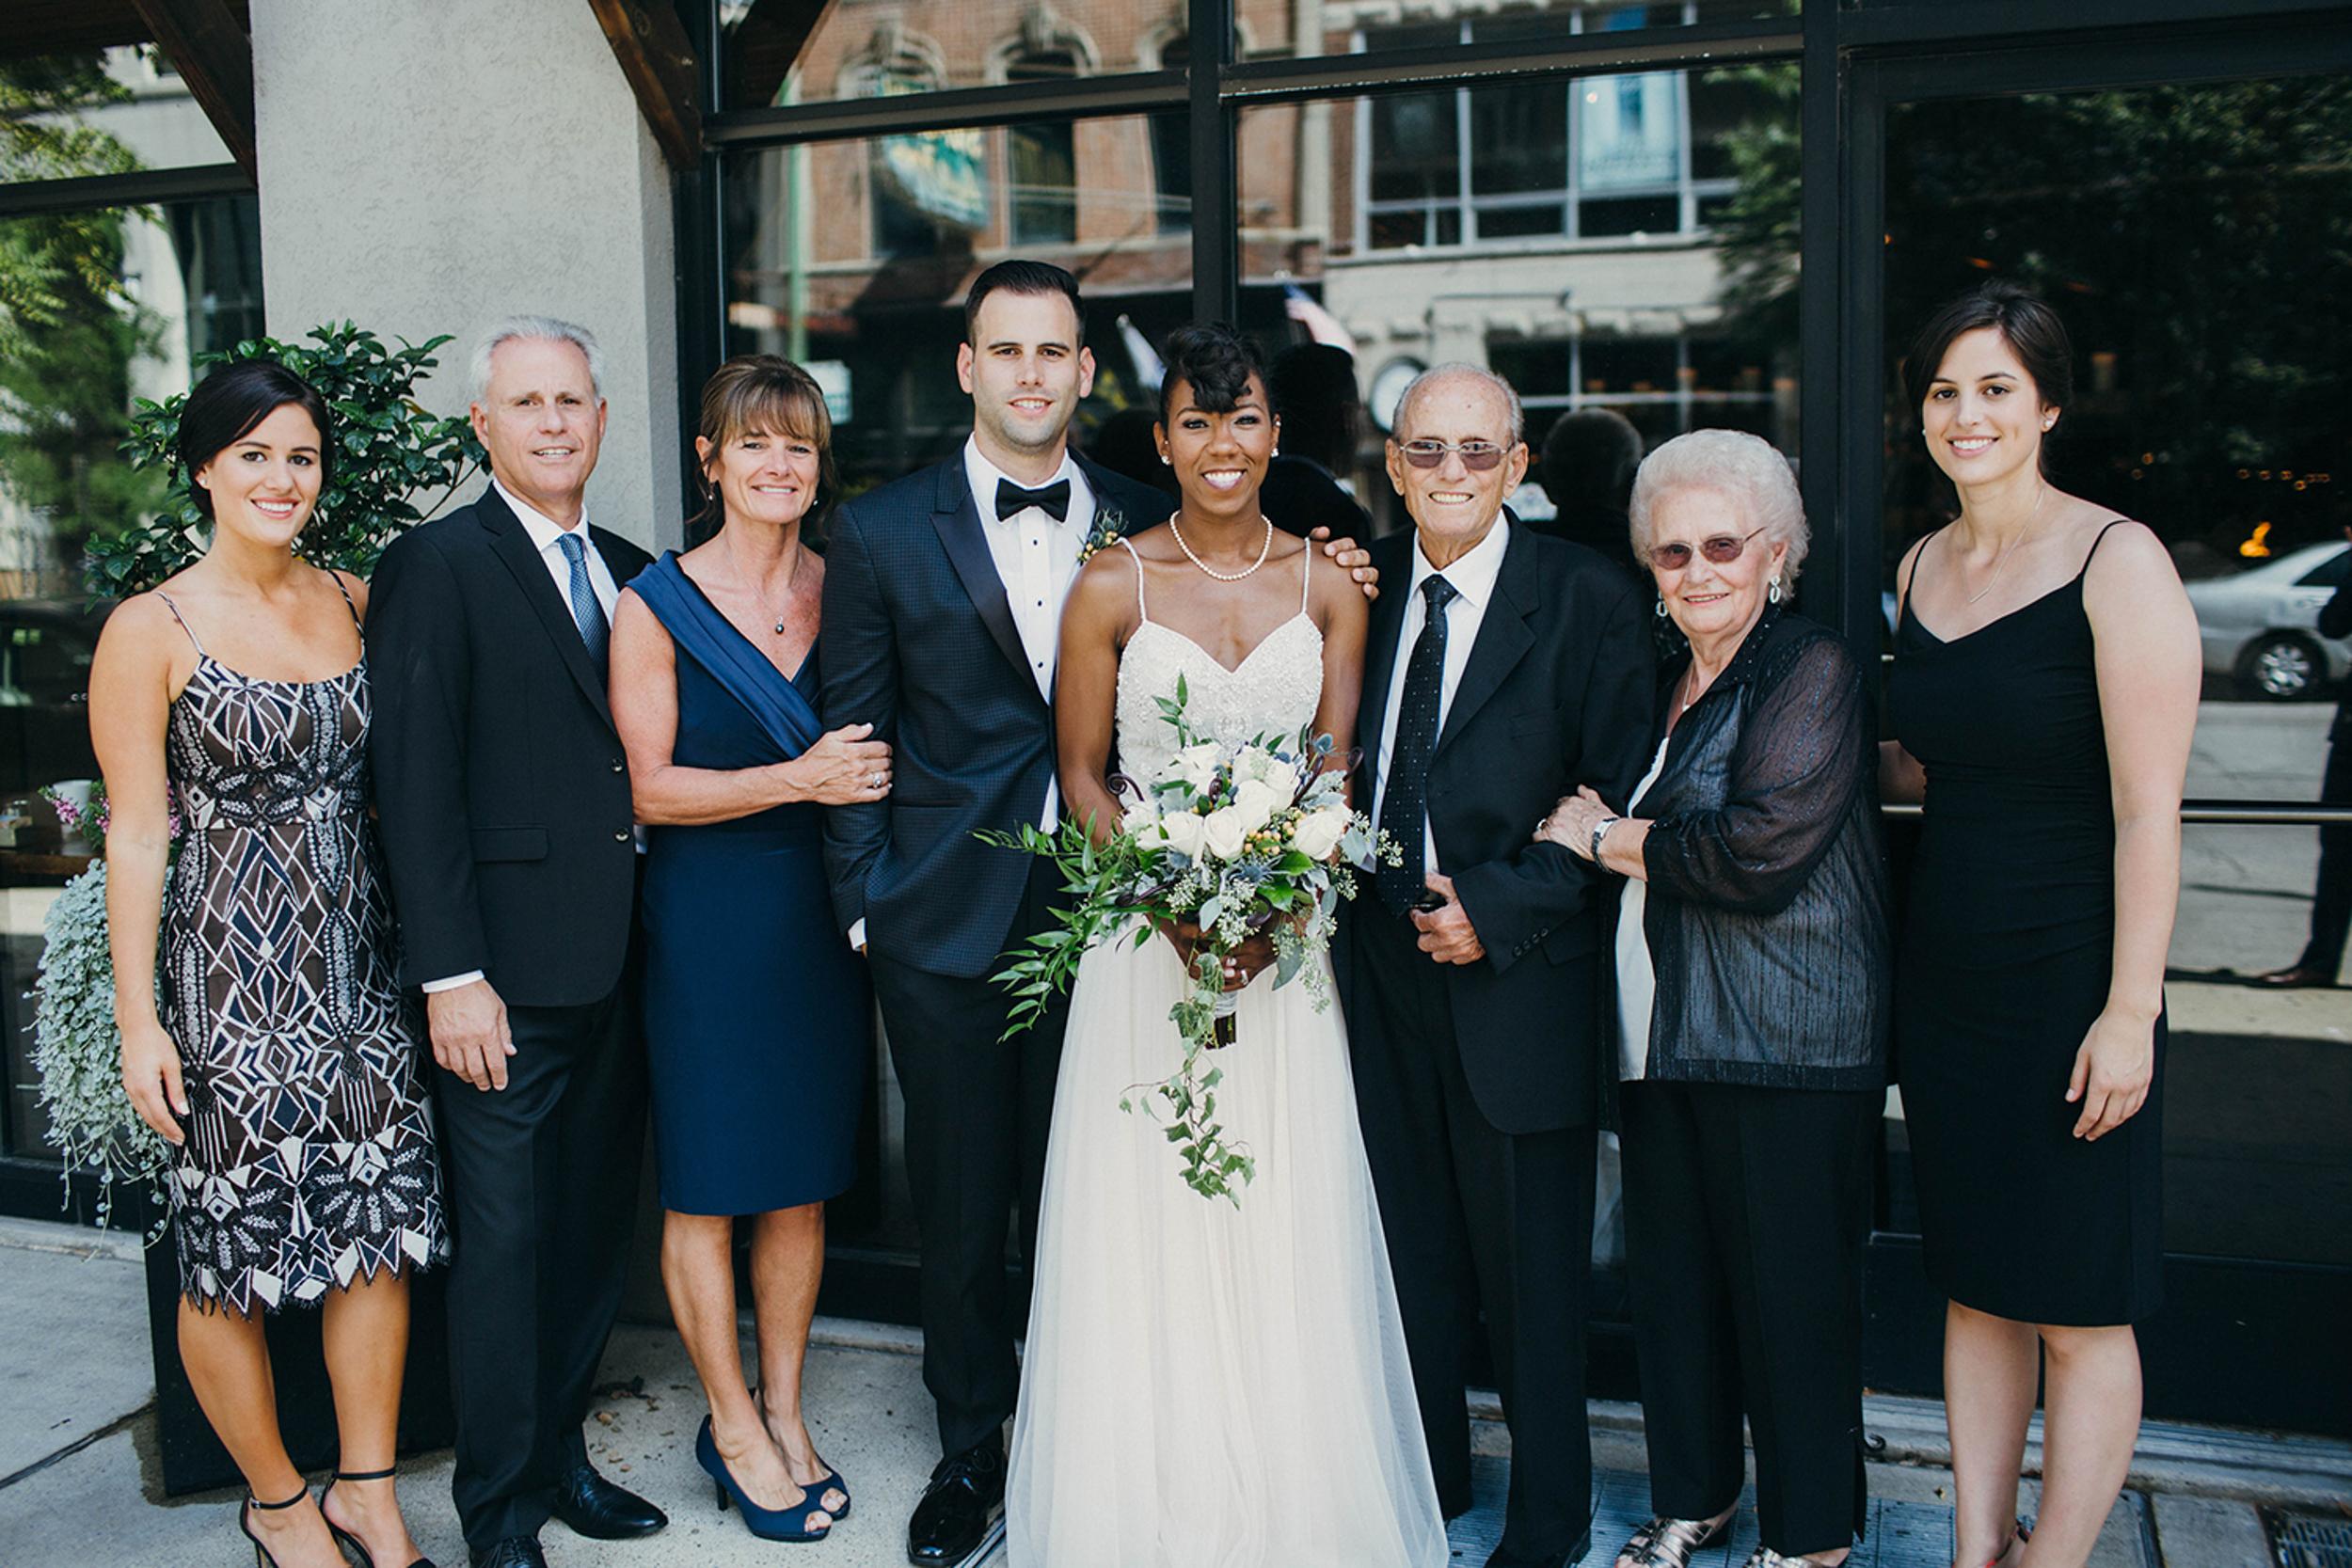 chicago.wedding.urban.intimate.zed451.lake.milton olive park-56.jpg